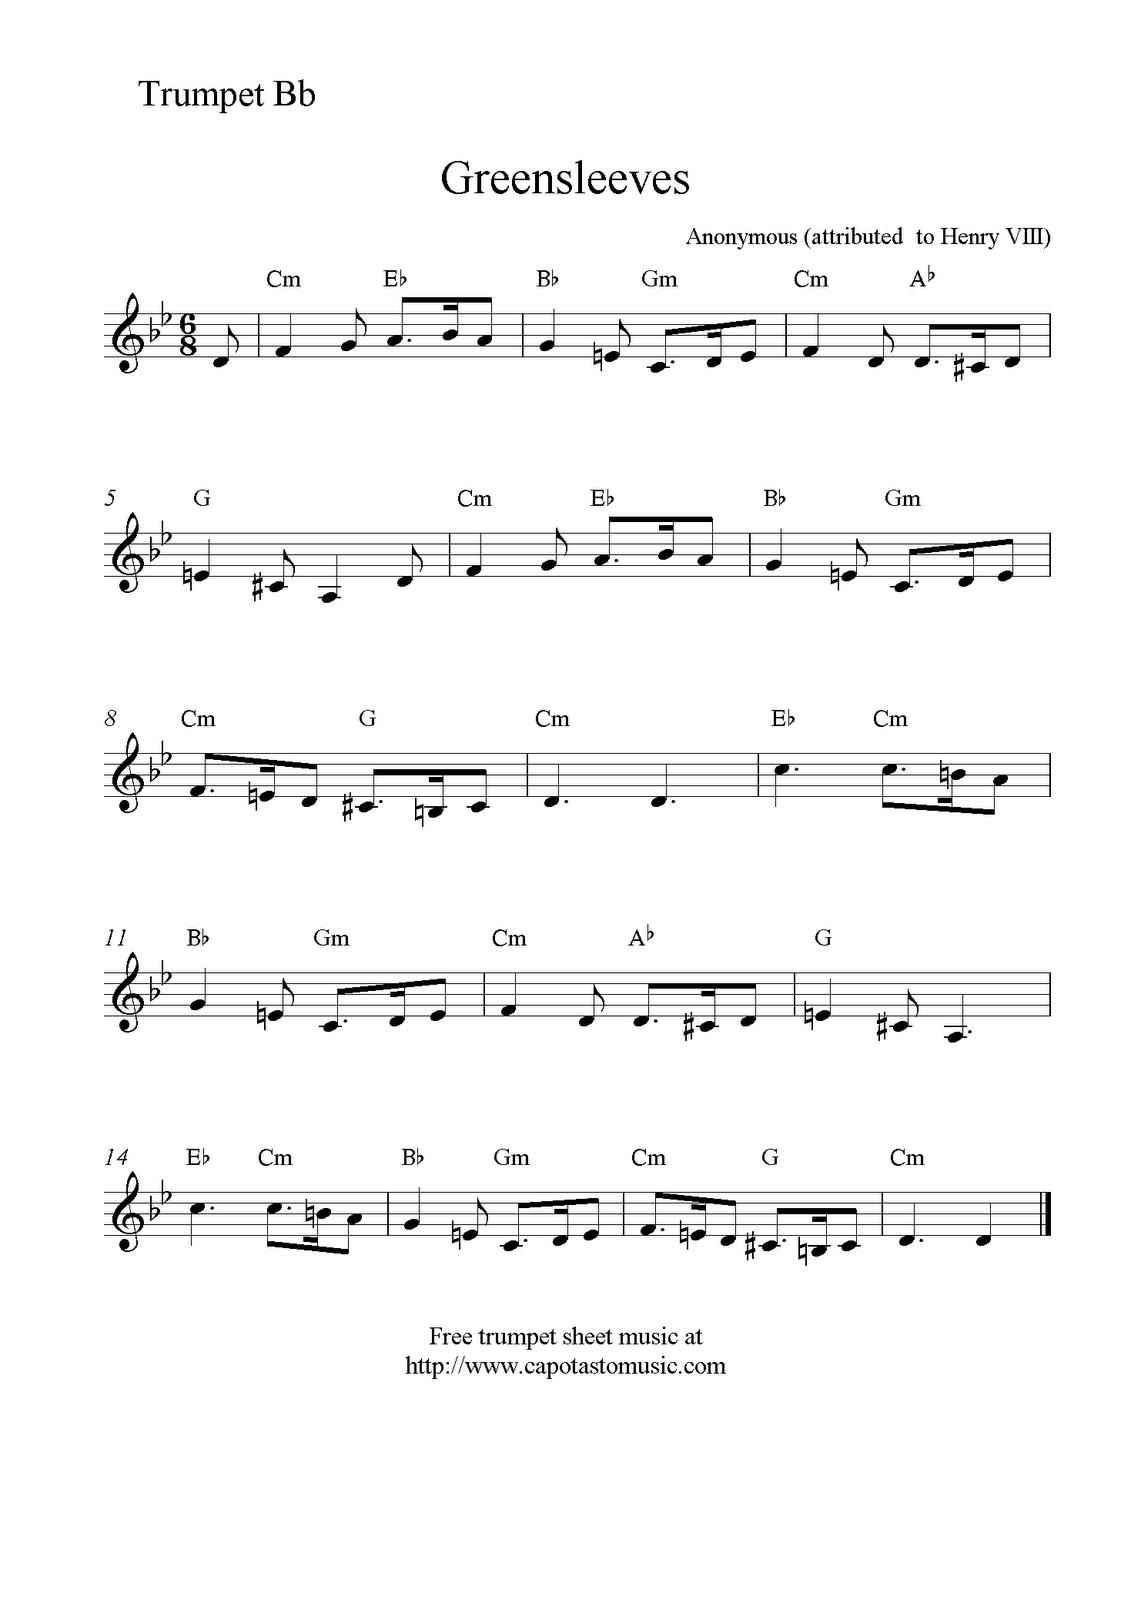 Greensleeves, Free Trumpet Sheet Music Notes - Free Printable Sheet Music For Trumpet